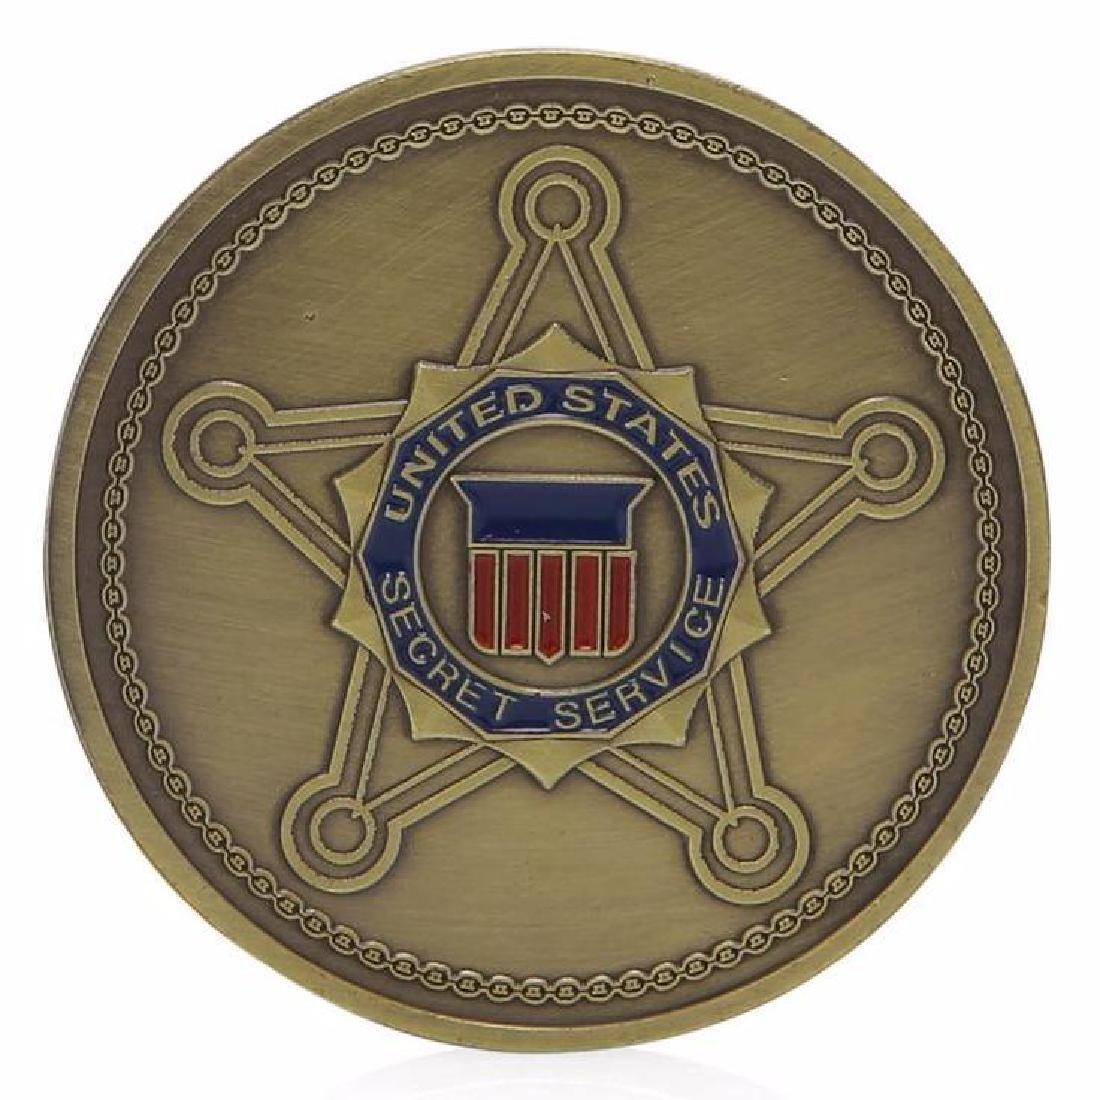 USA Secret Service Colored Challenge Coin